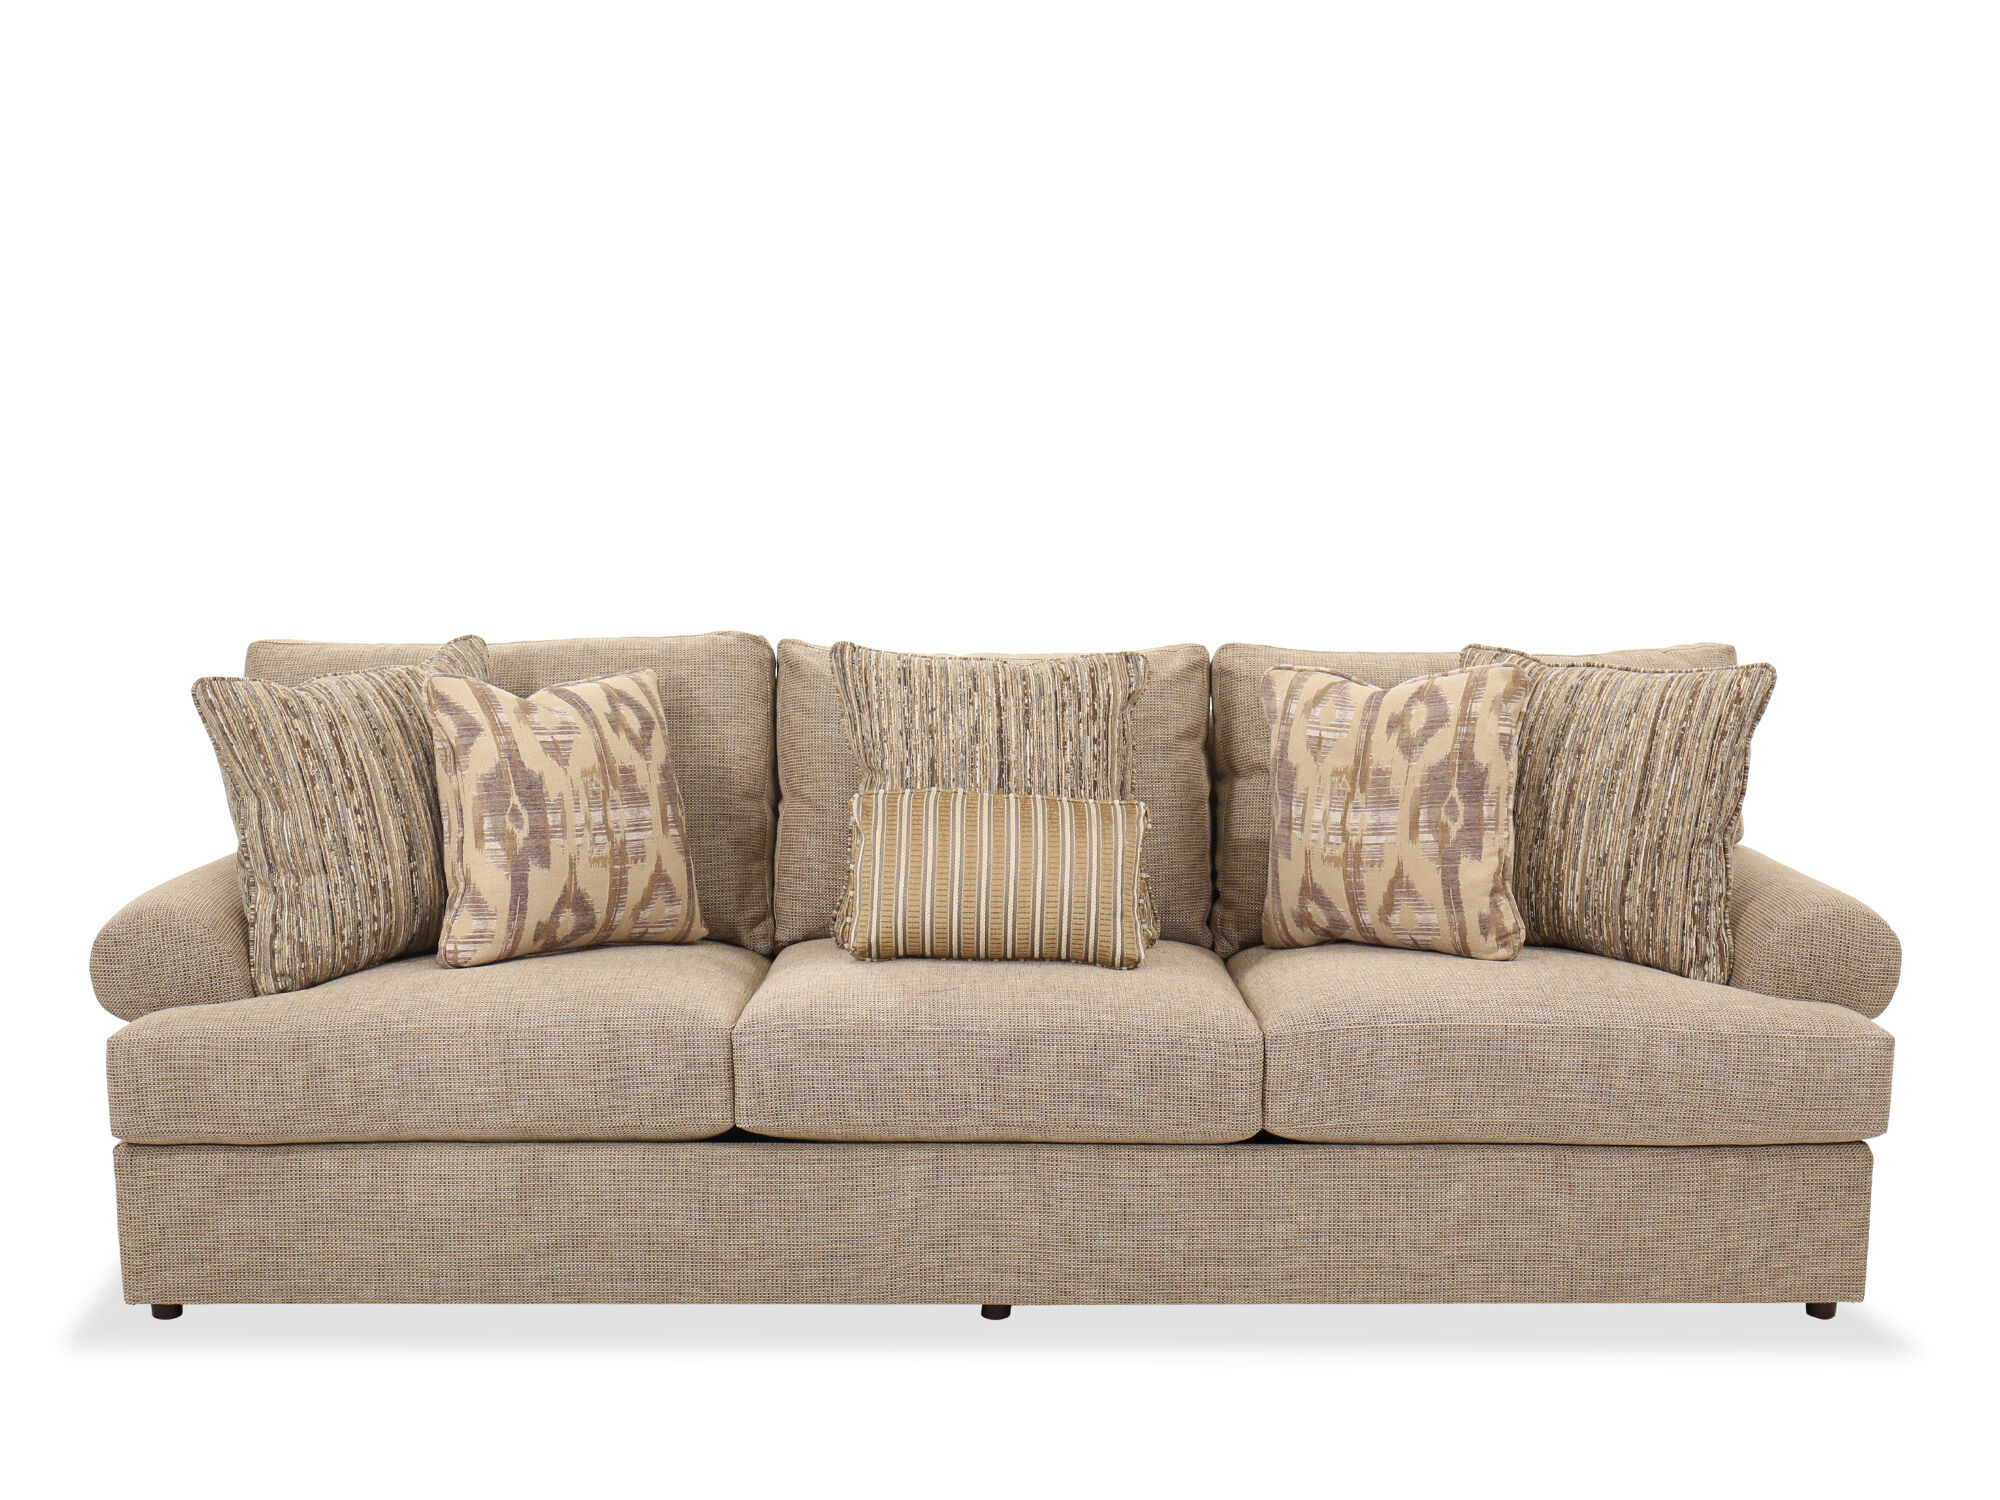 bernhardt riviera large sofa sofas de ikea andrew finley reviews